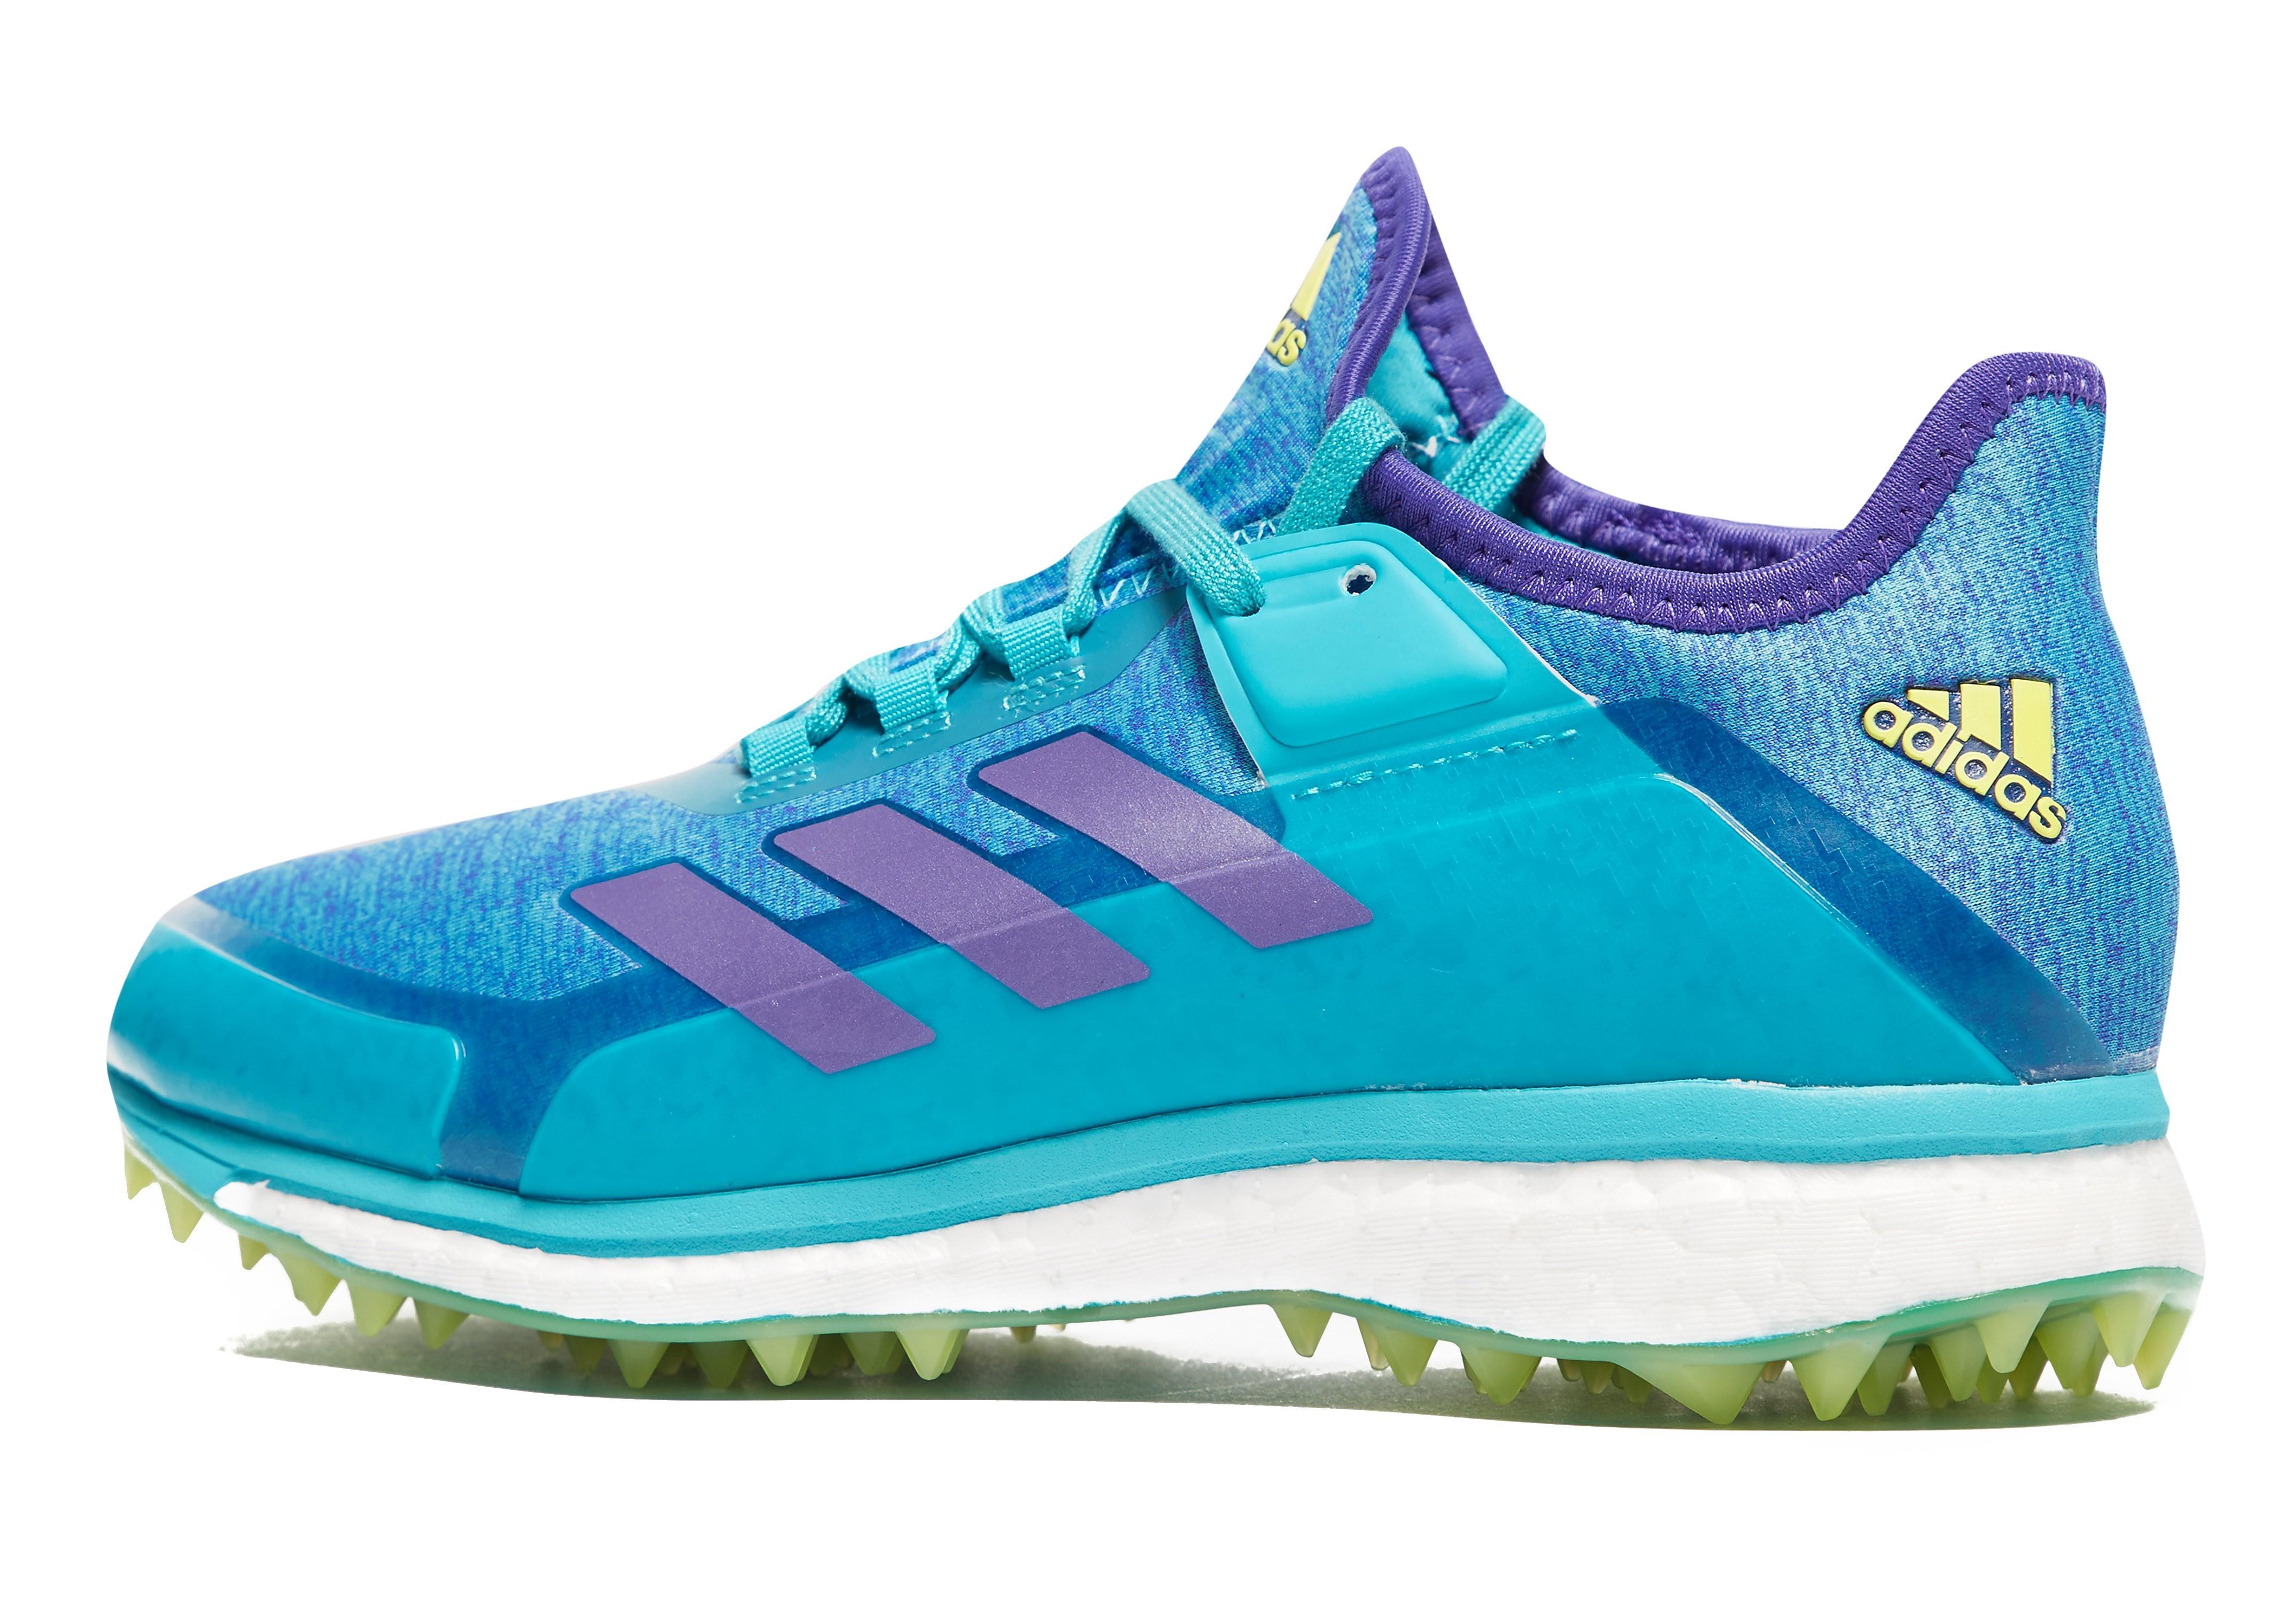 adidas Fabela X Aqua Hockey Shoes Women's